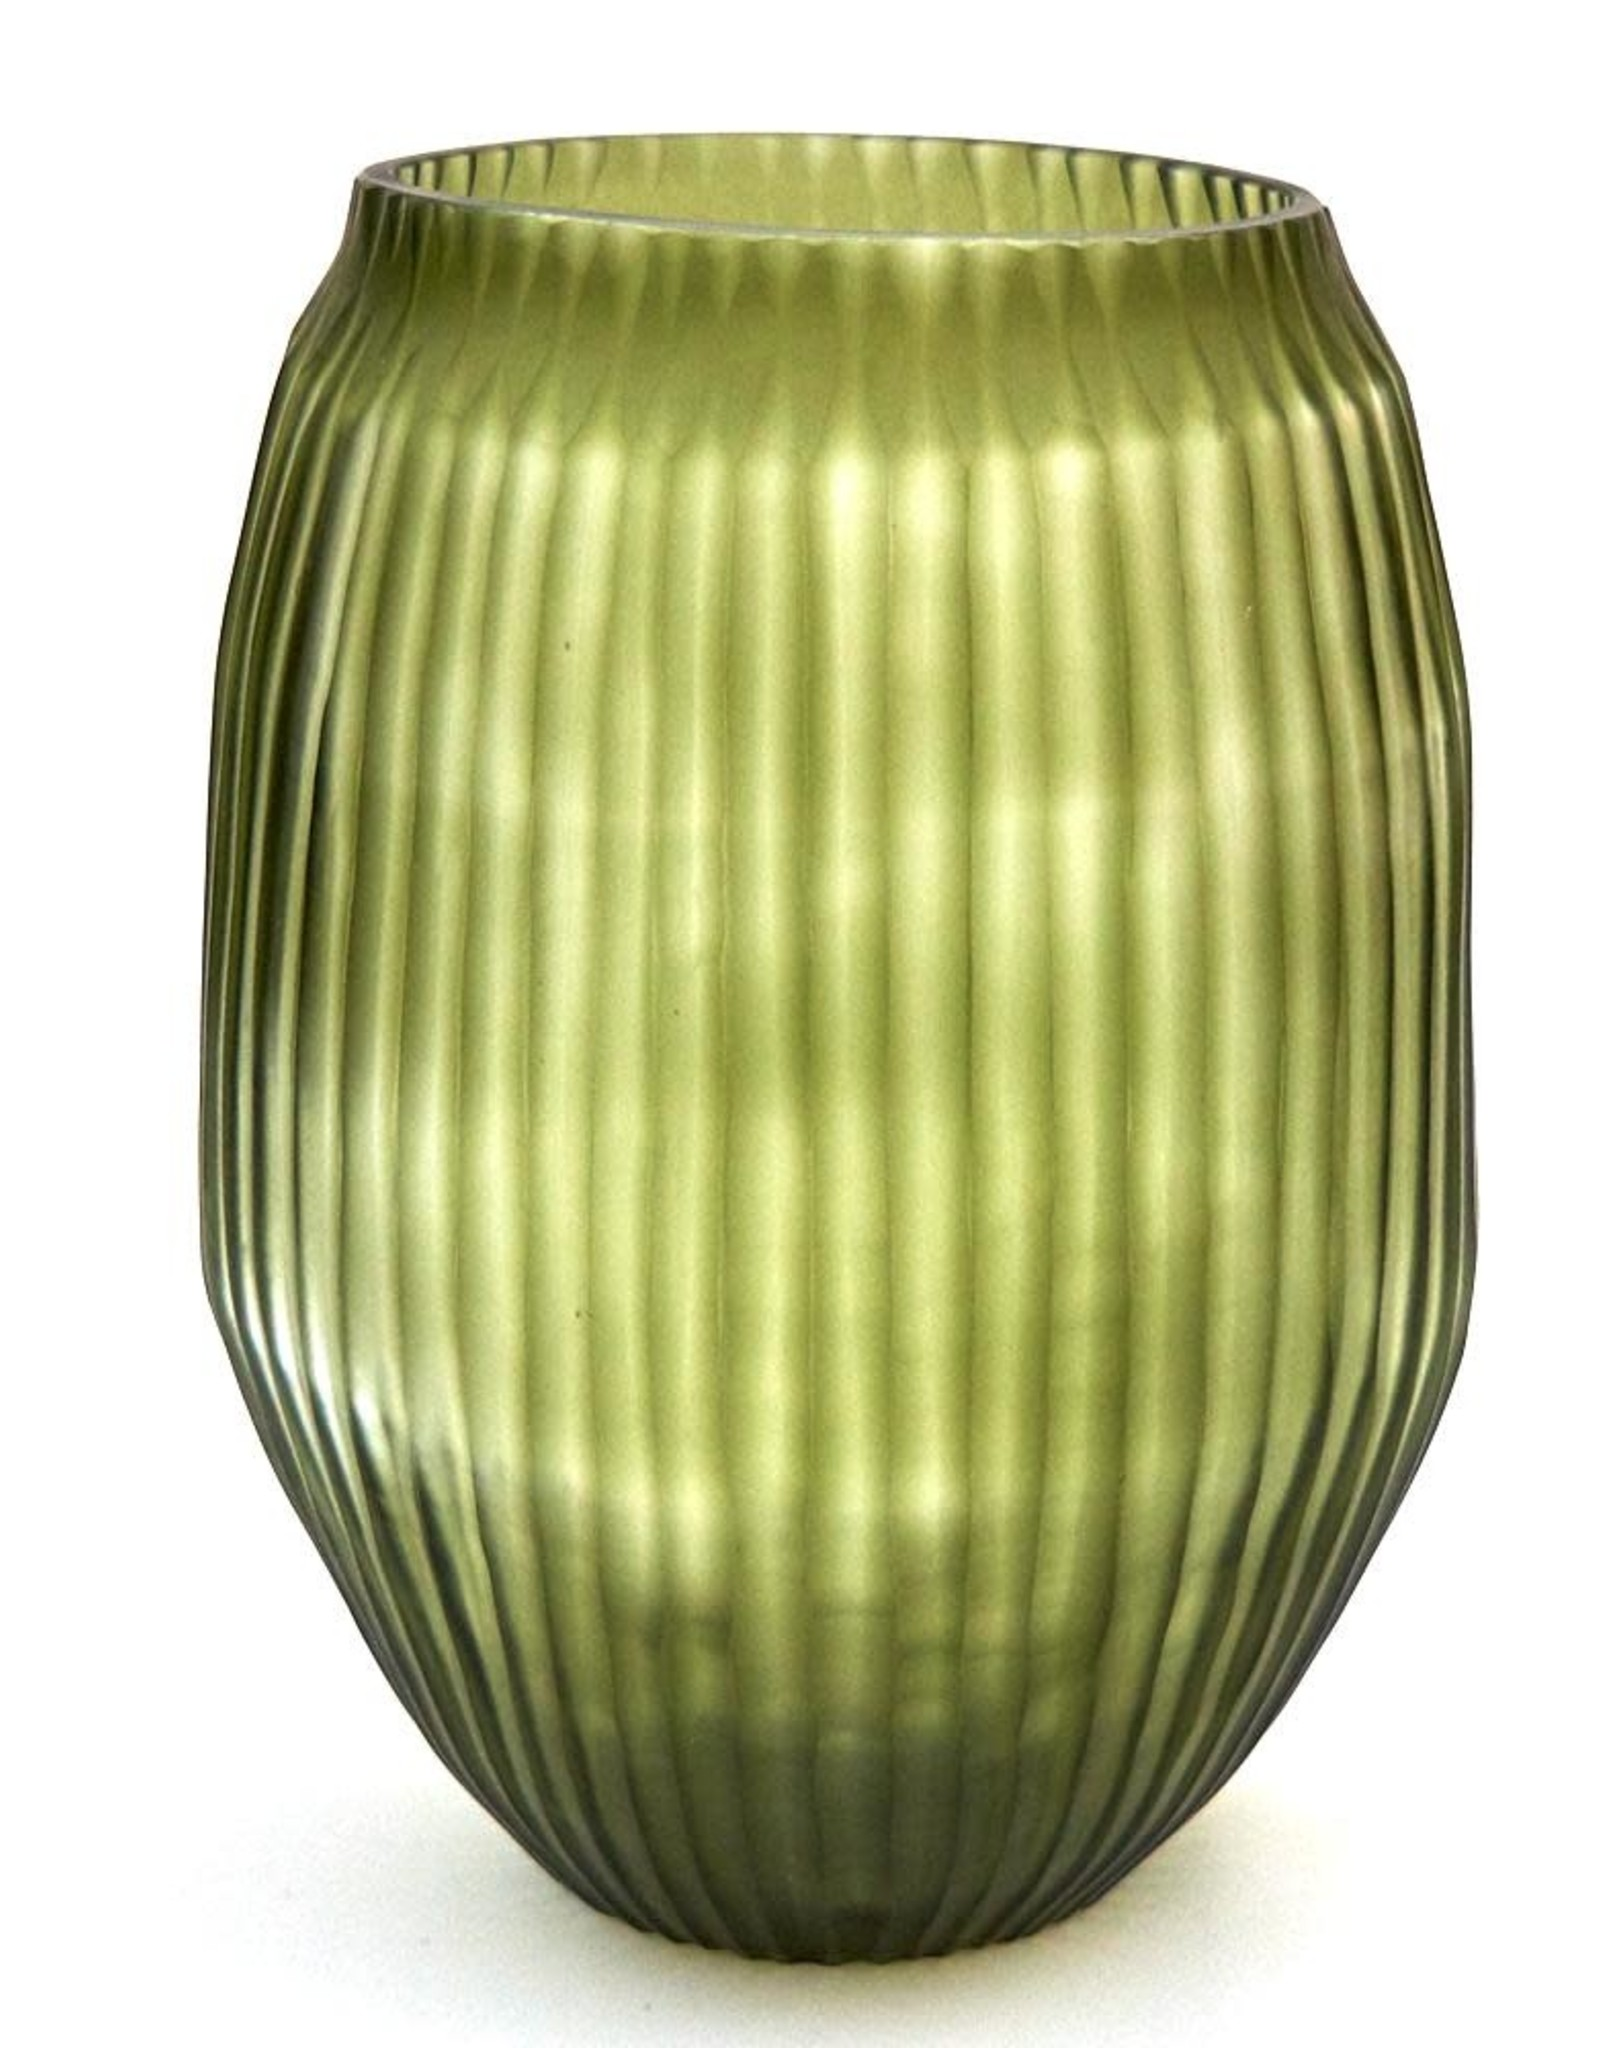 Brisonhome Brian Tunks Cut Glass Vase Medium